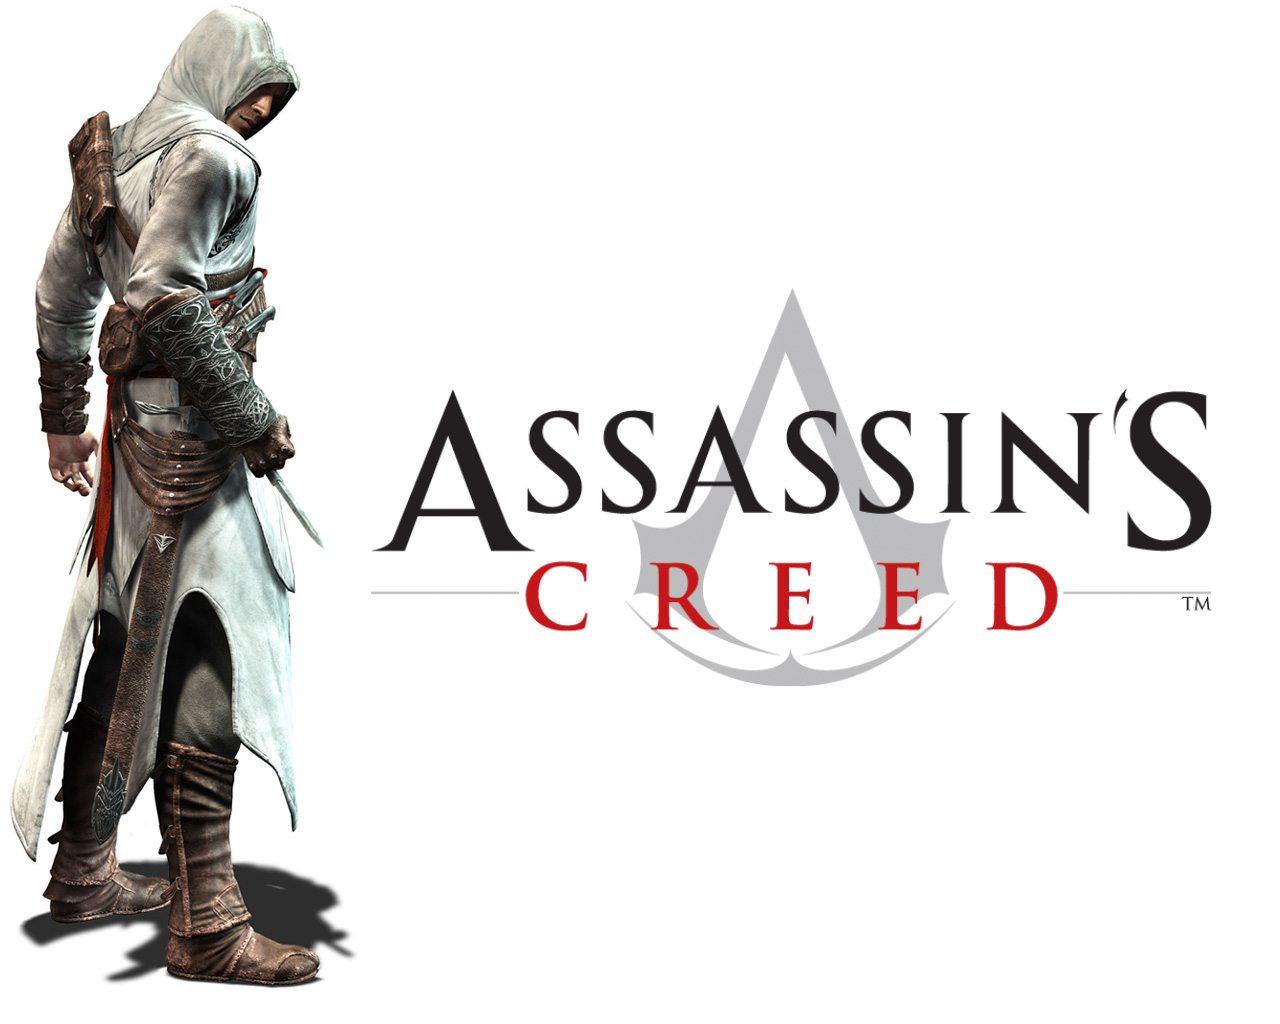 AssassinsCreed_bagogames